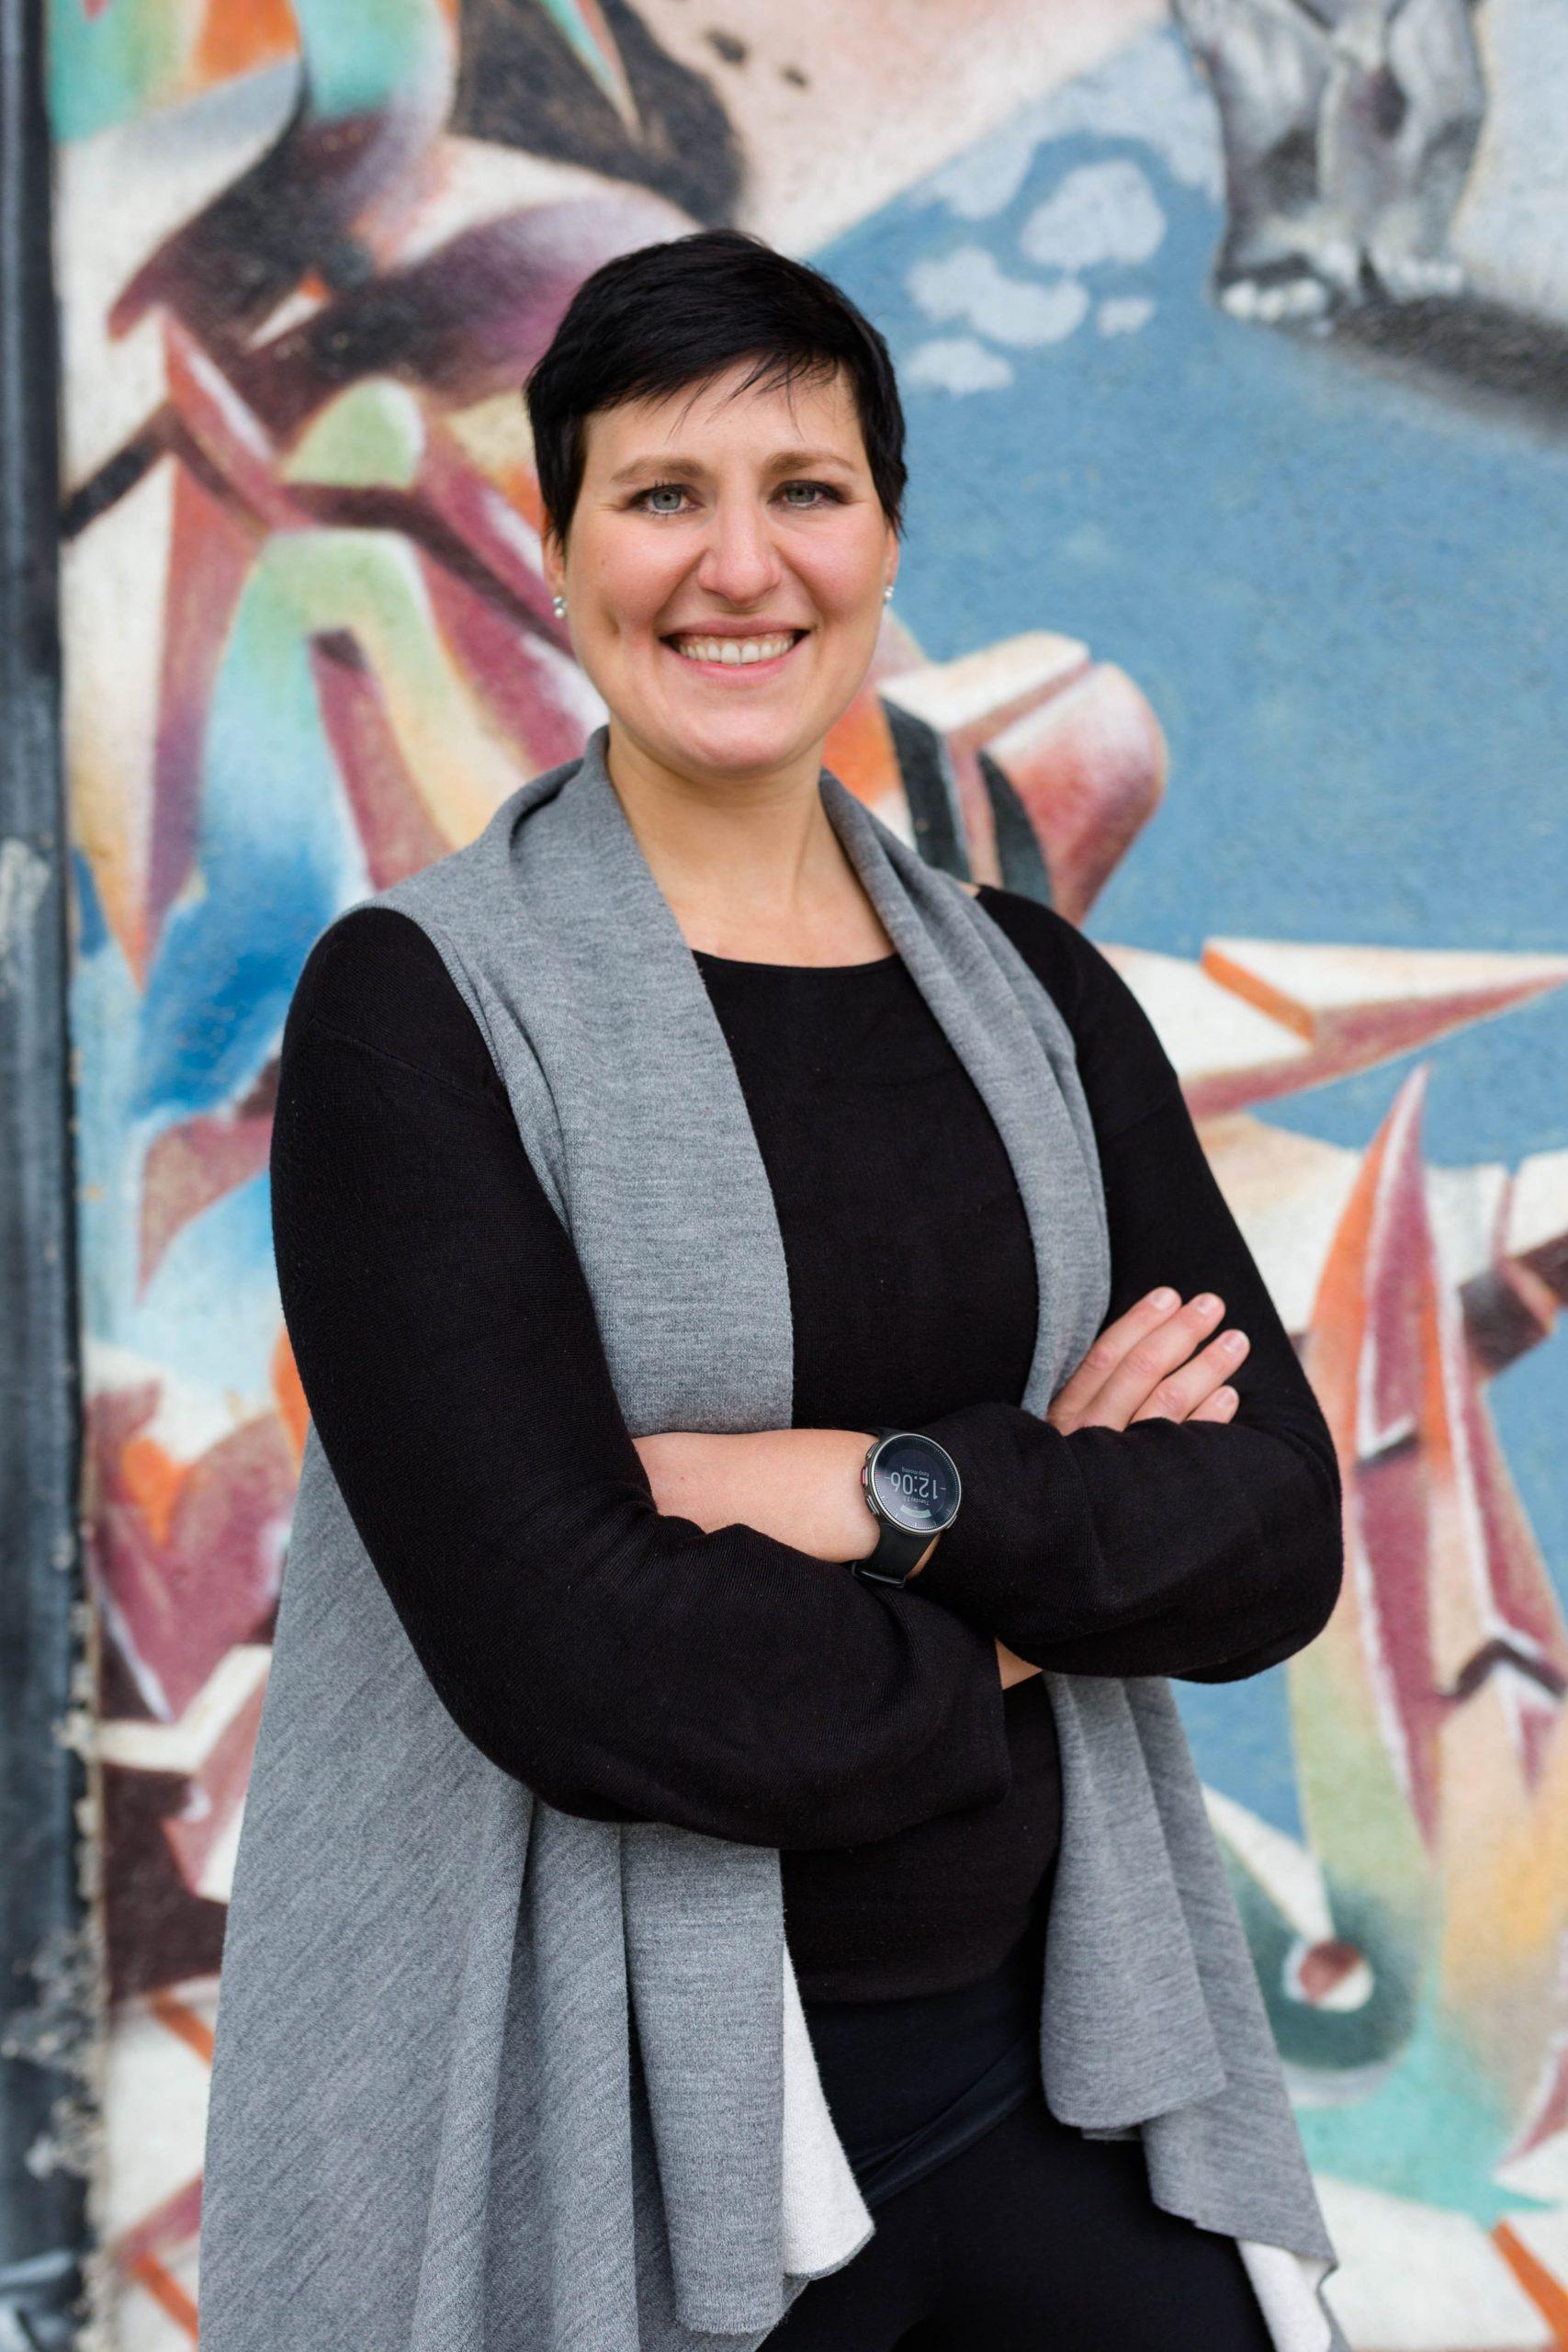 Simone Bild